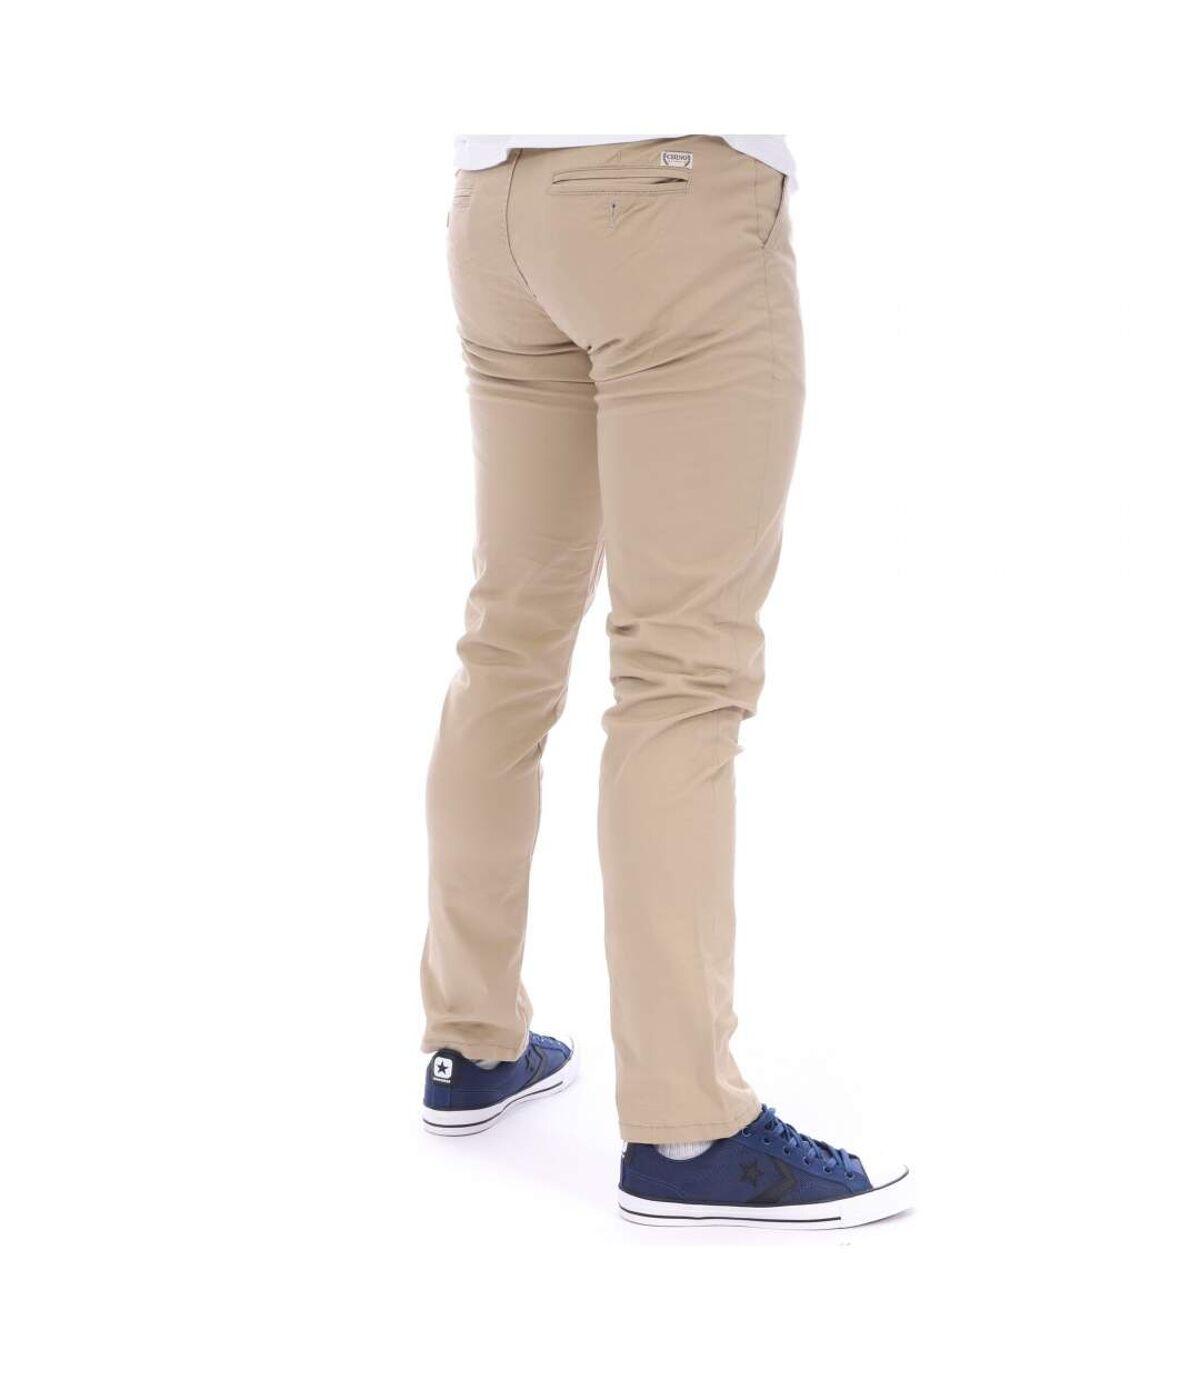 Pantalon Chino Homme beige CHINO AUTHENTIC